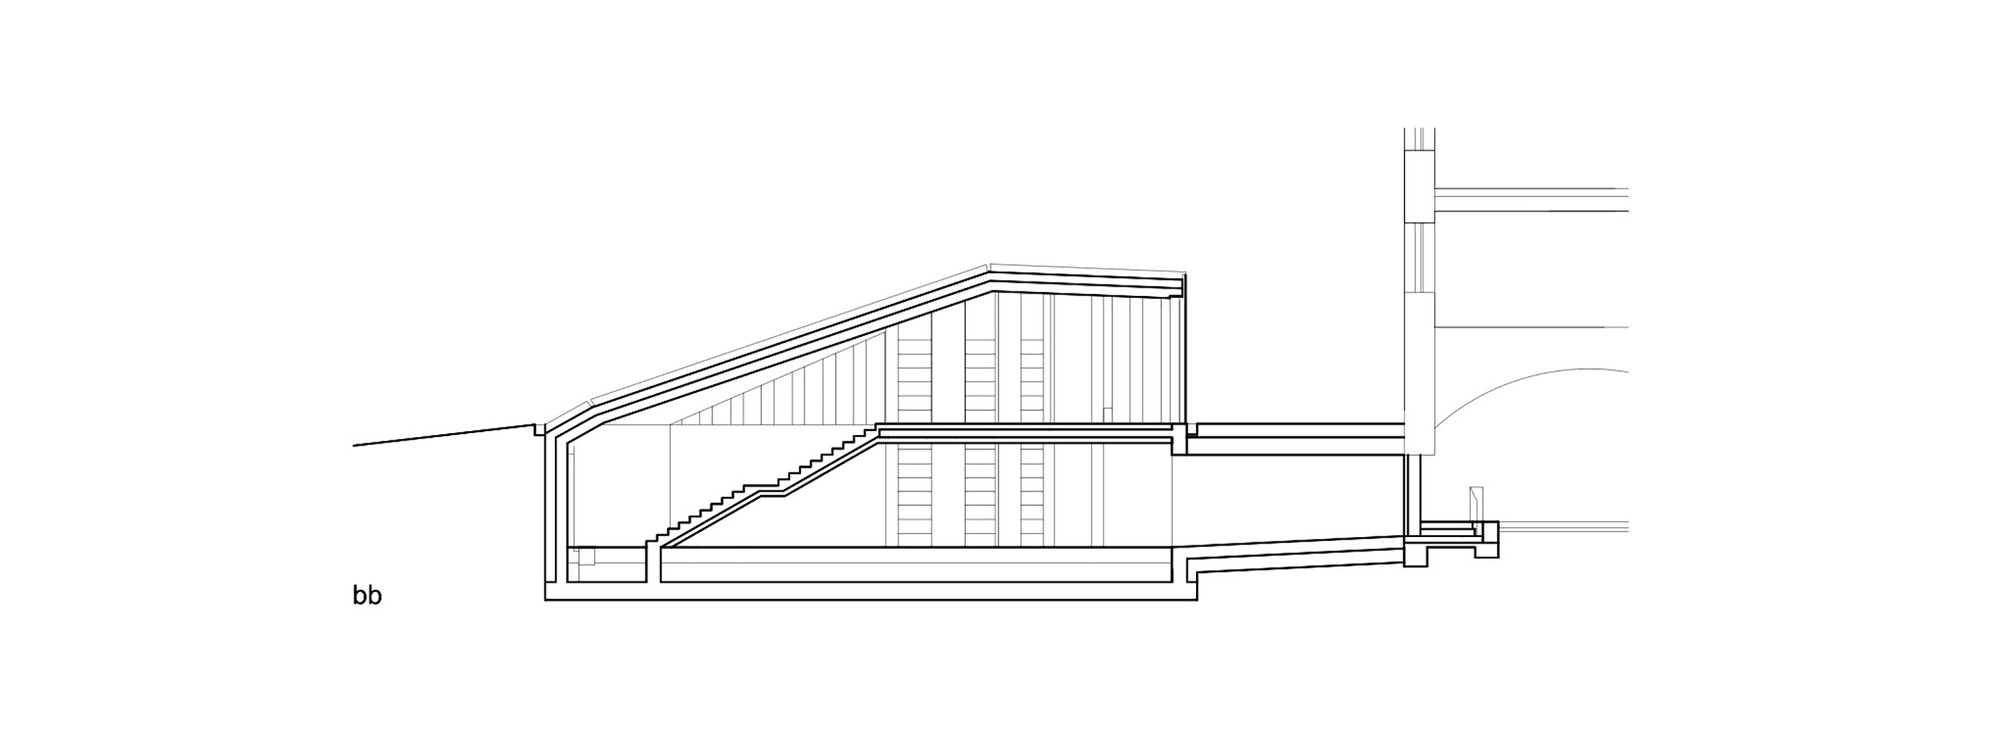 Section_BB.jpg